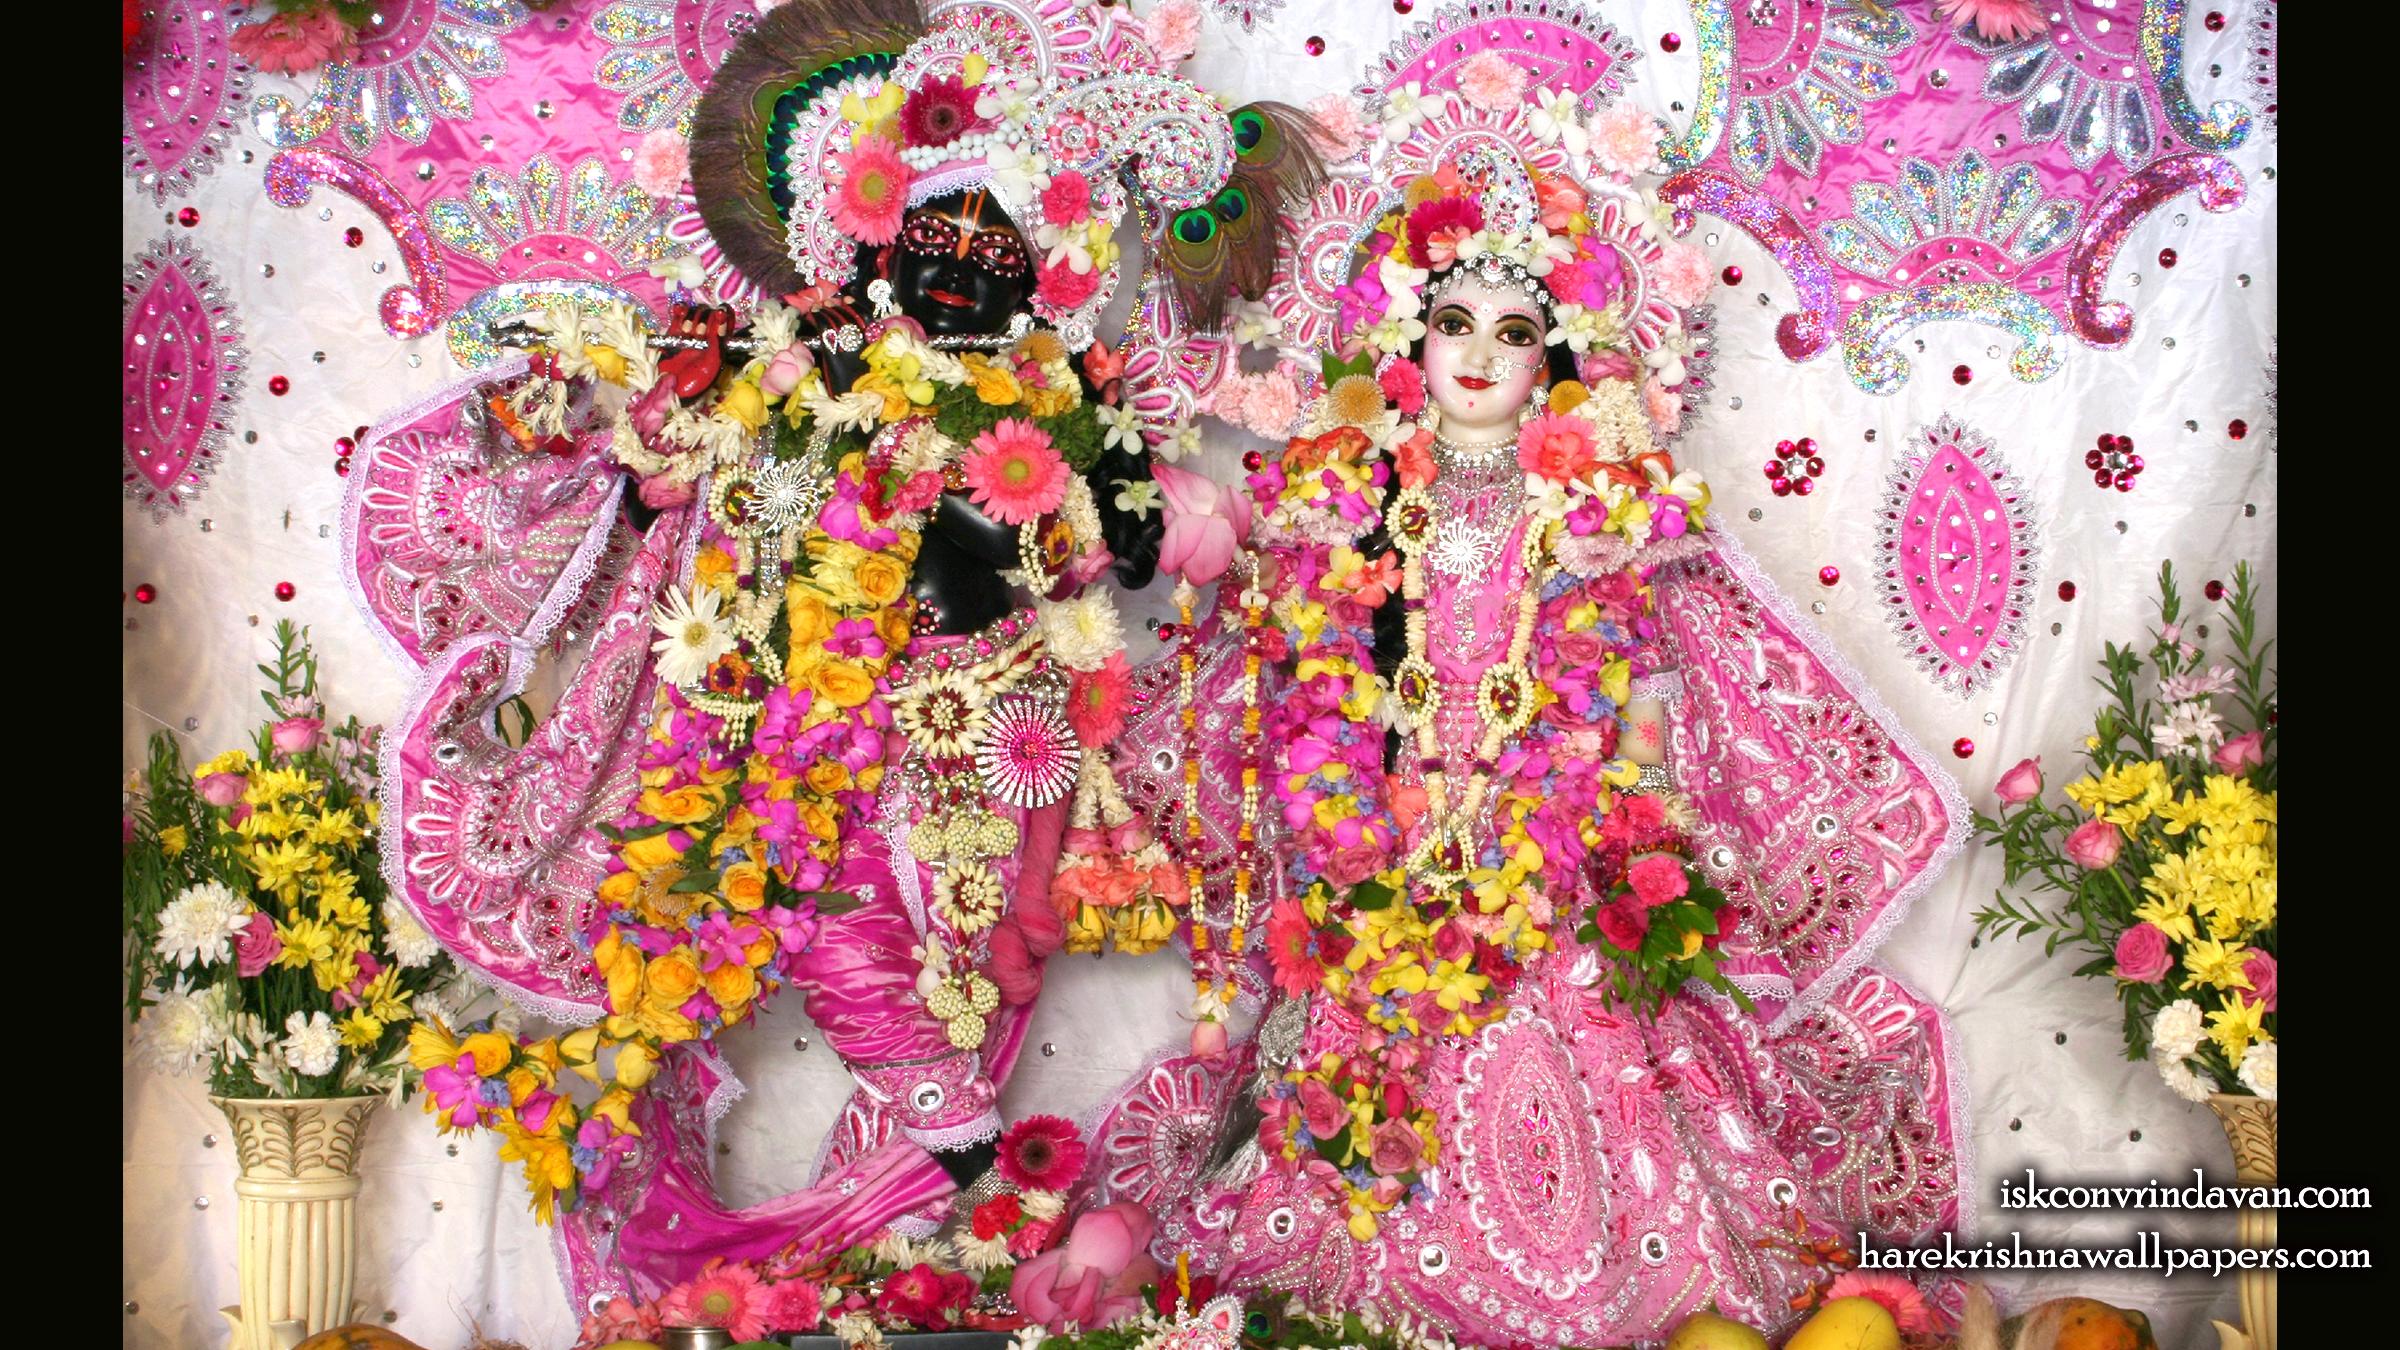 Sri Sri Radha Shyamsundar Wallpaper (015) Size 2400x1350 Download